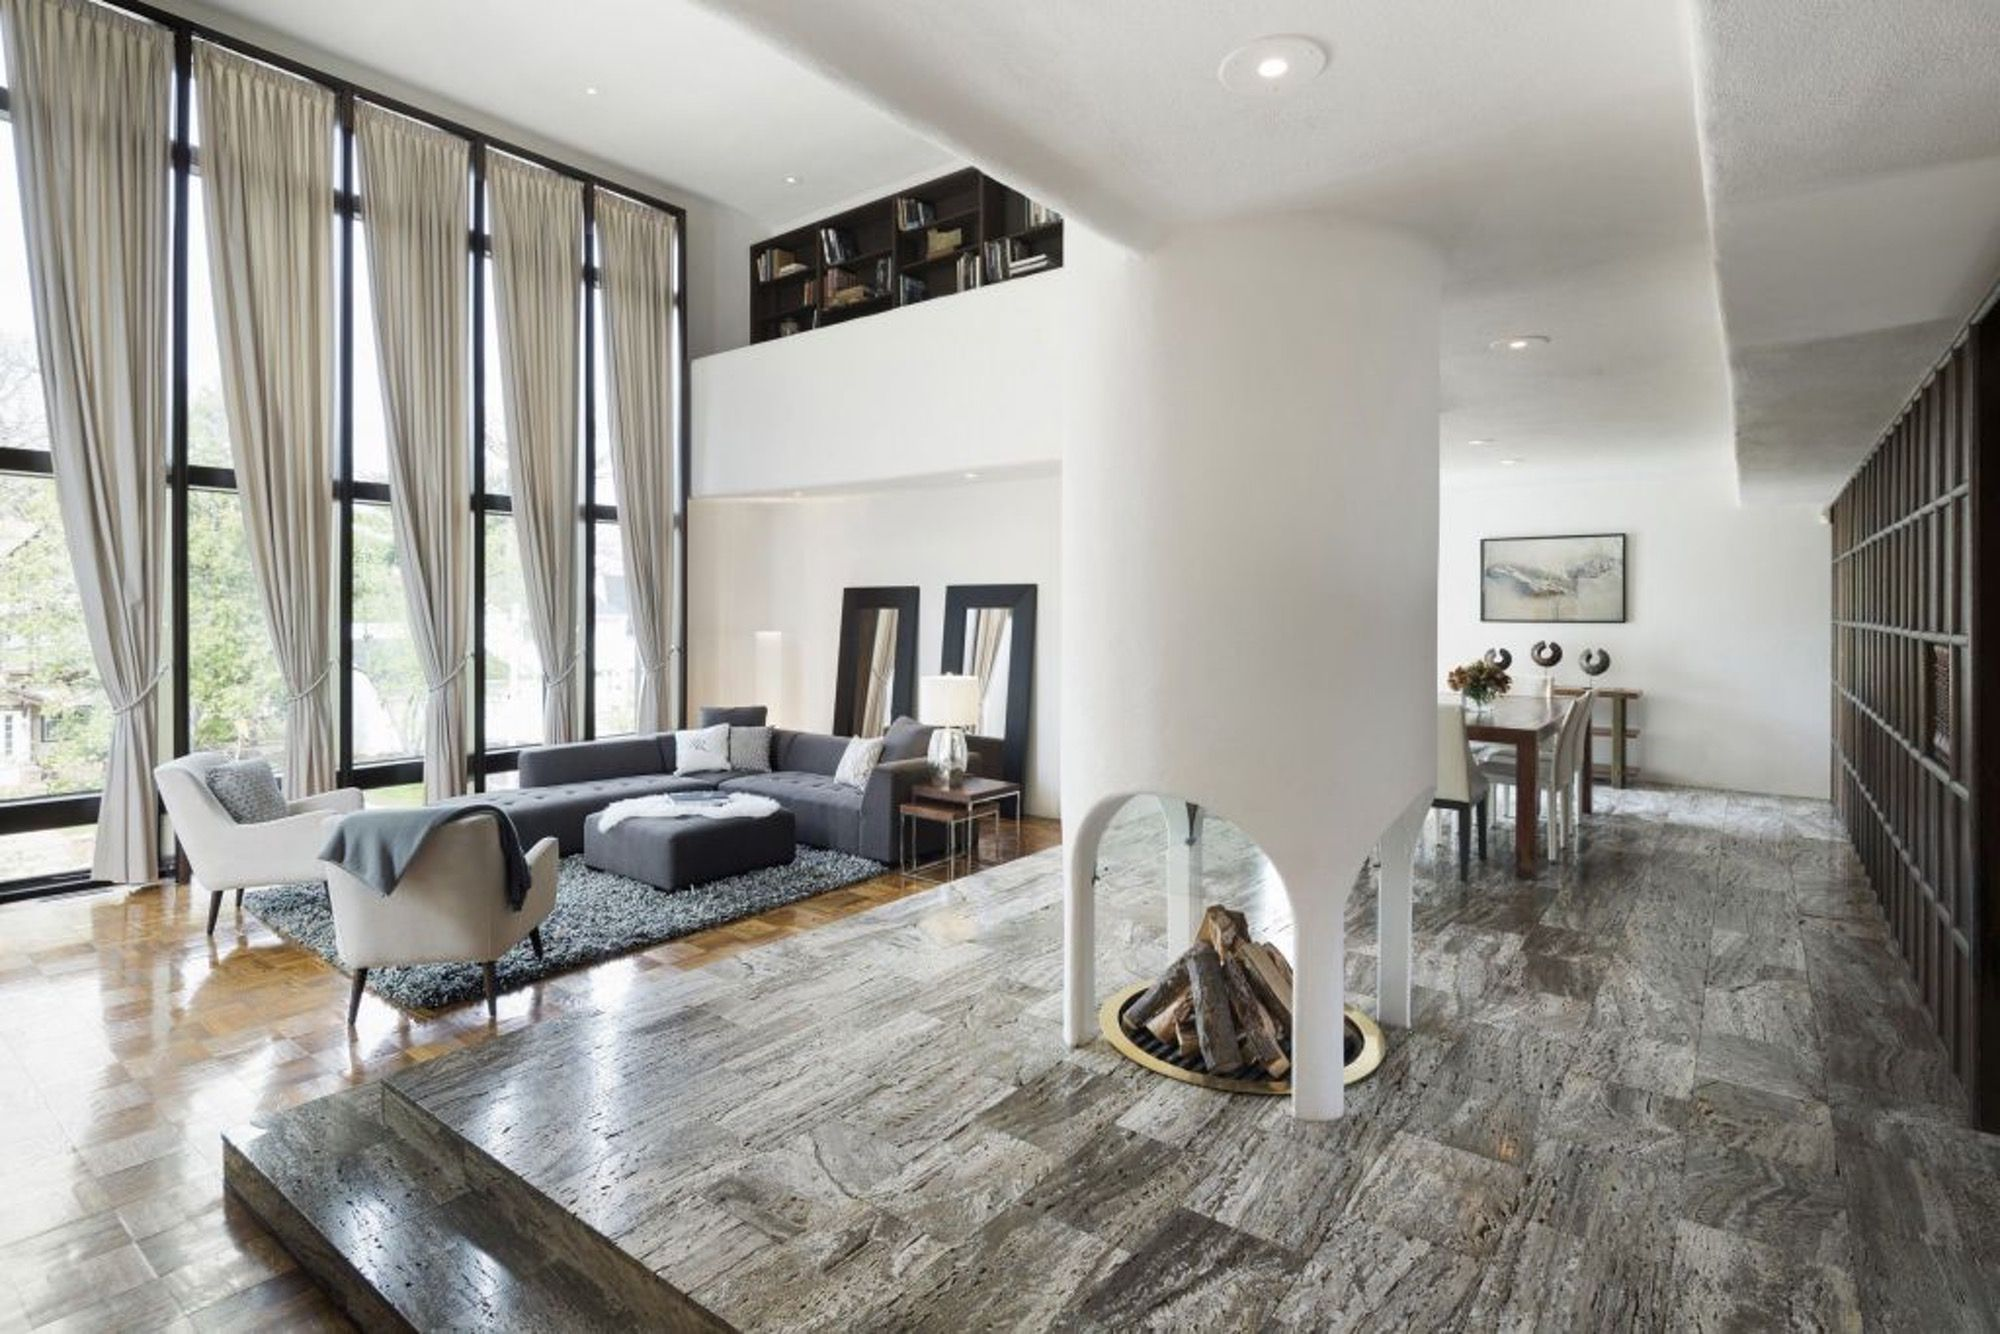 The Living Room Has 18 Foot Ceilings